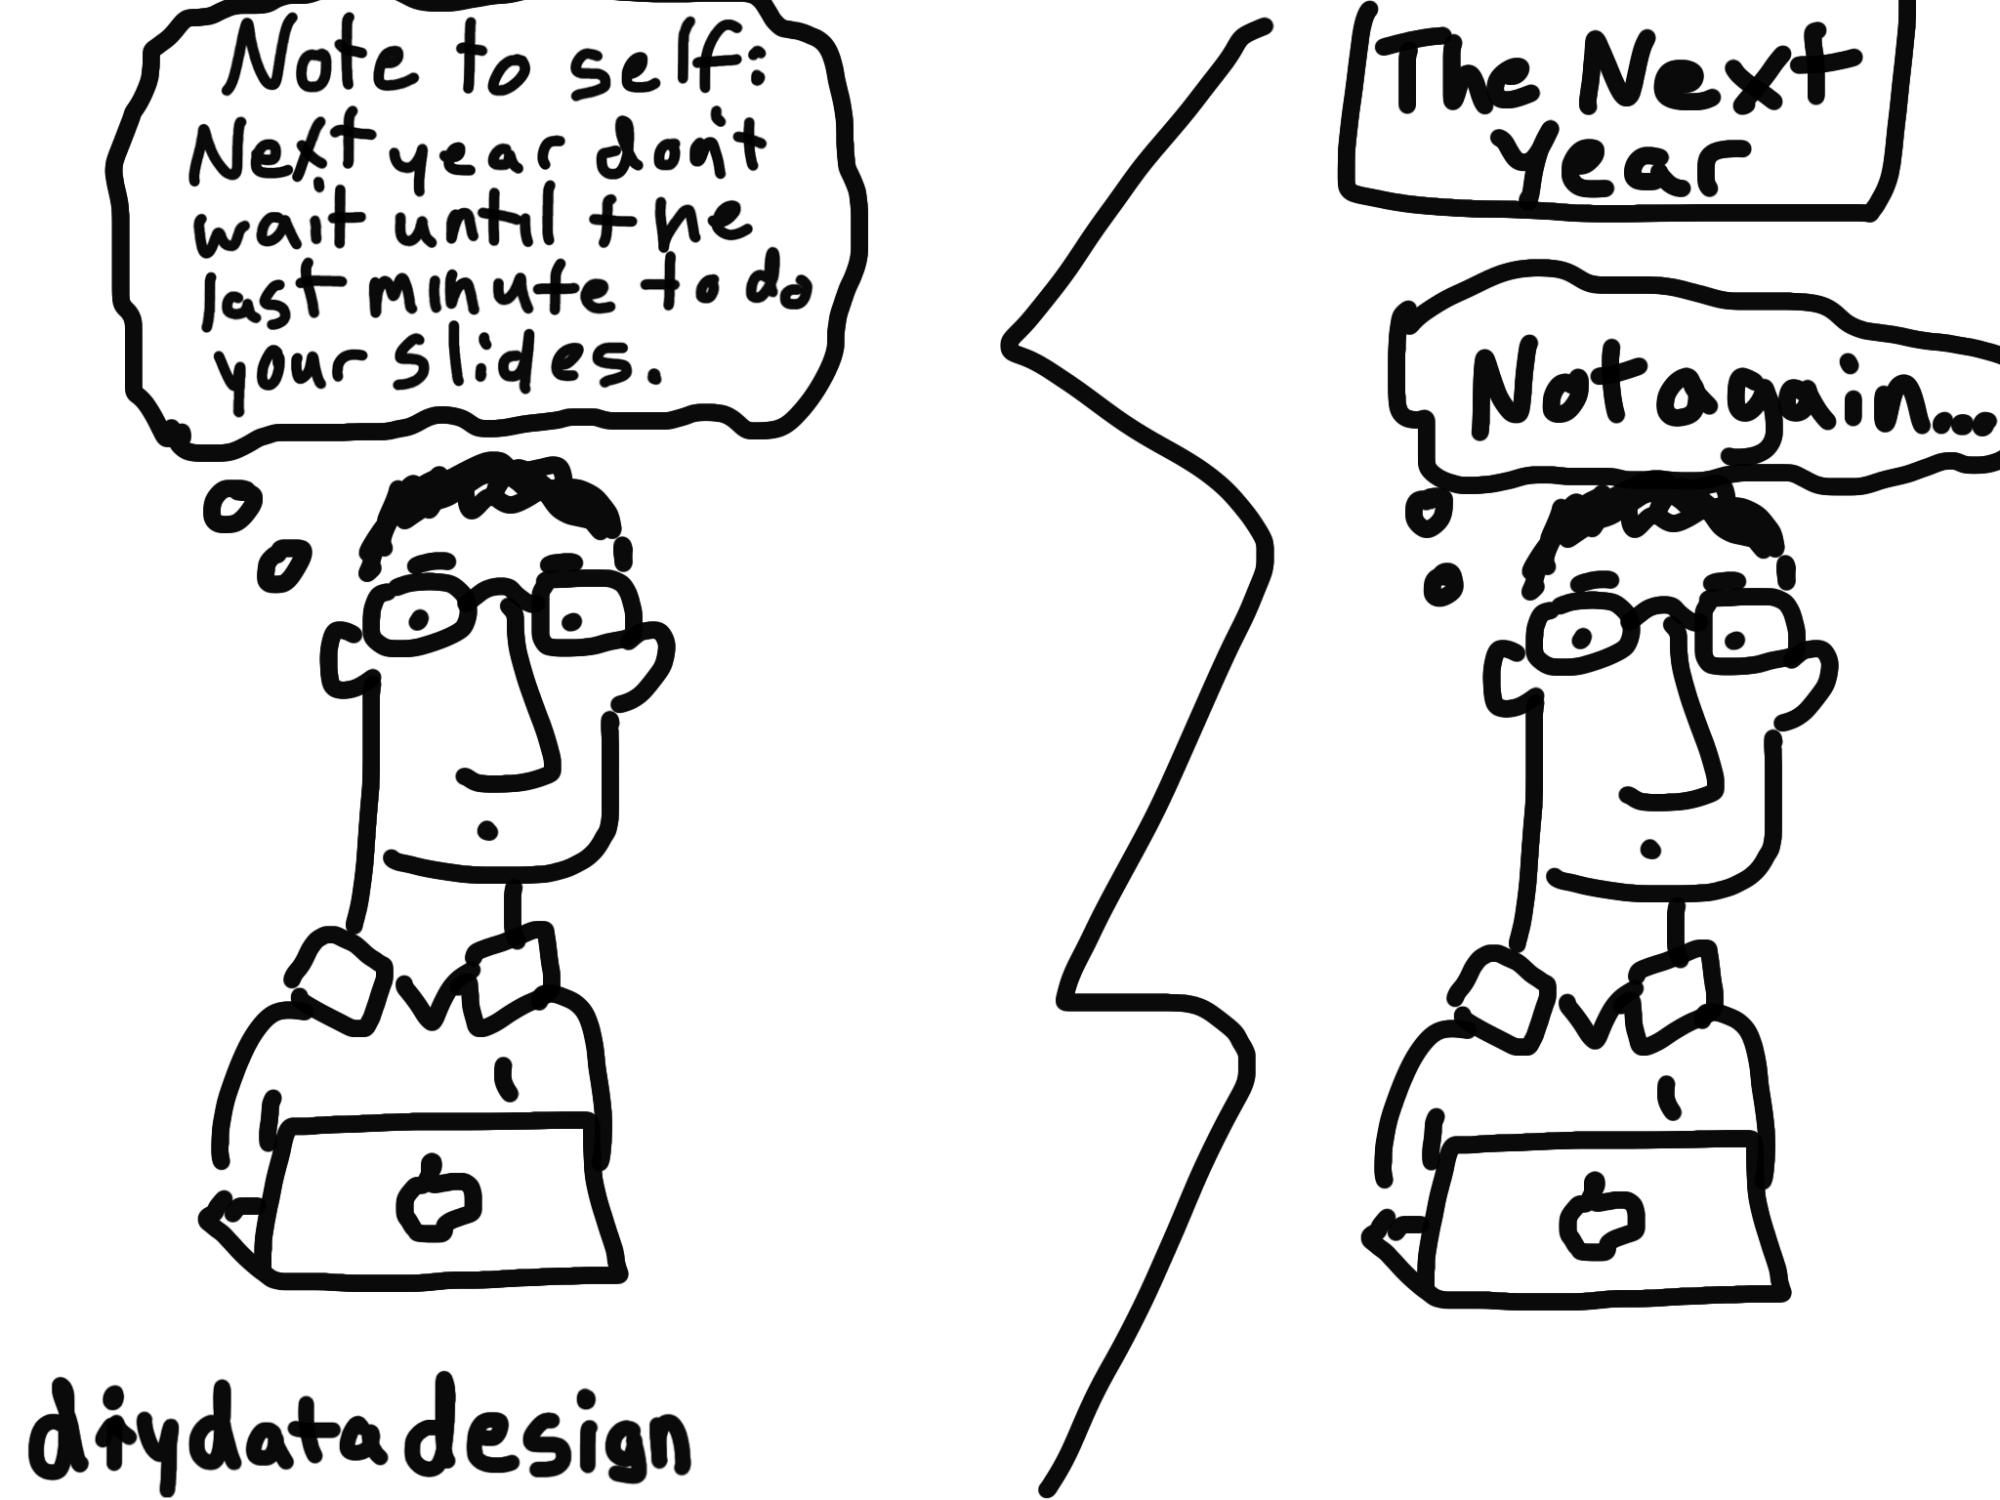 Last Minute Presentation Design